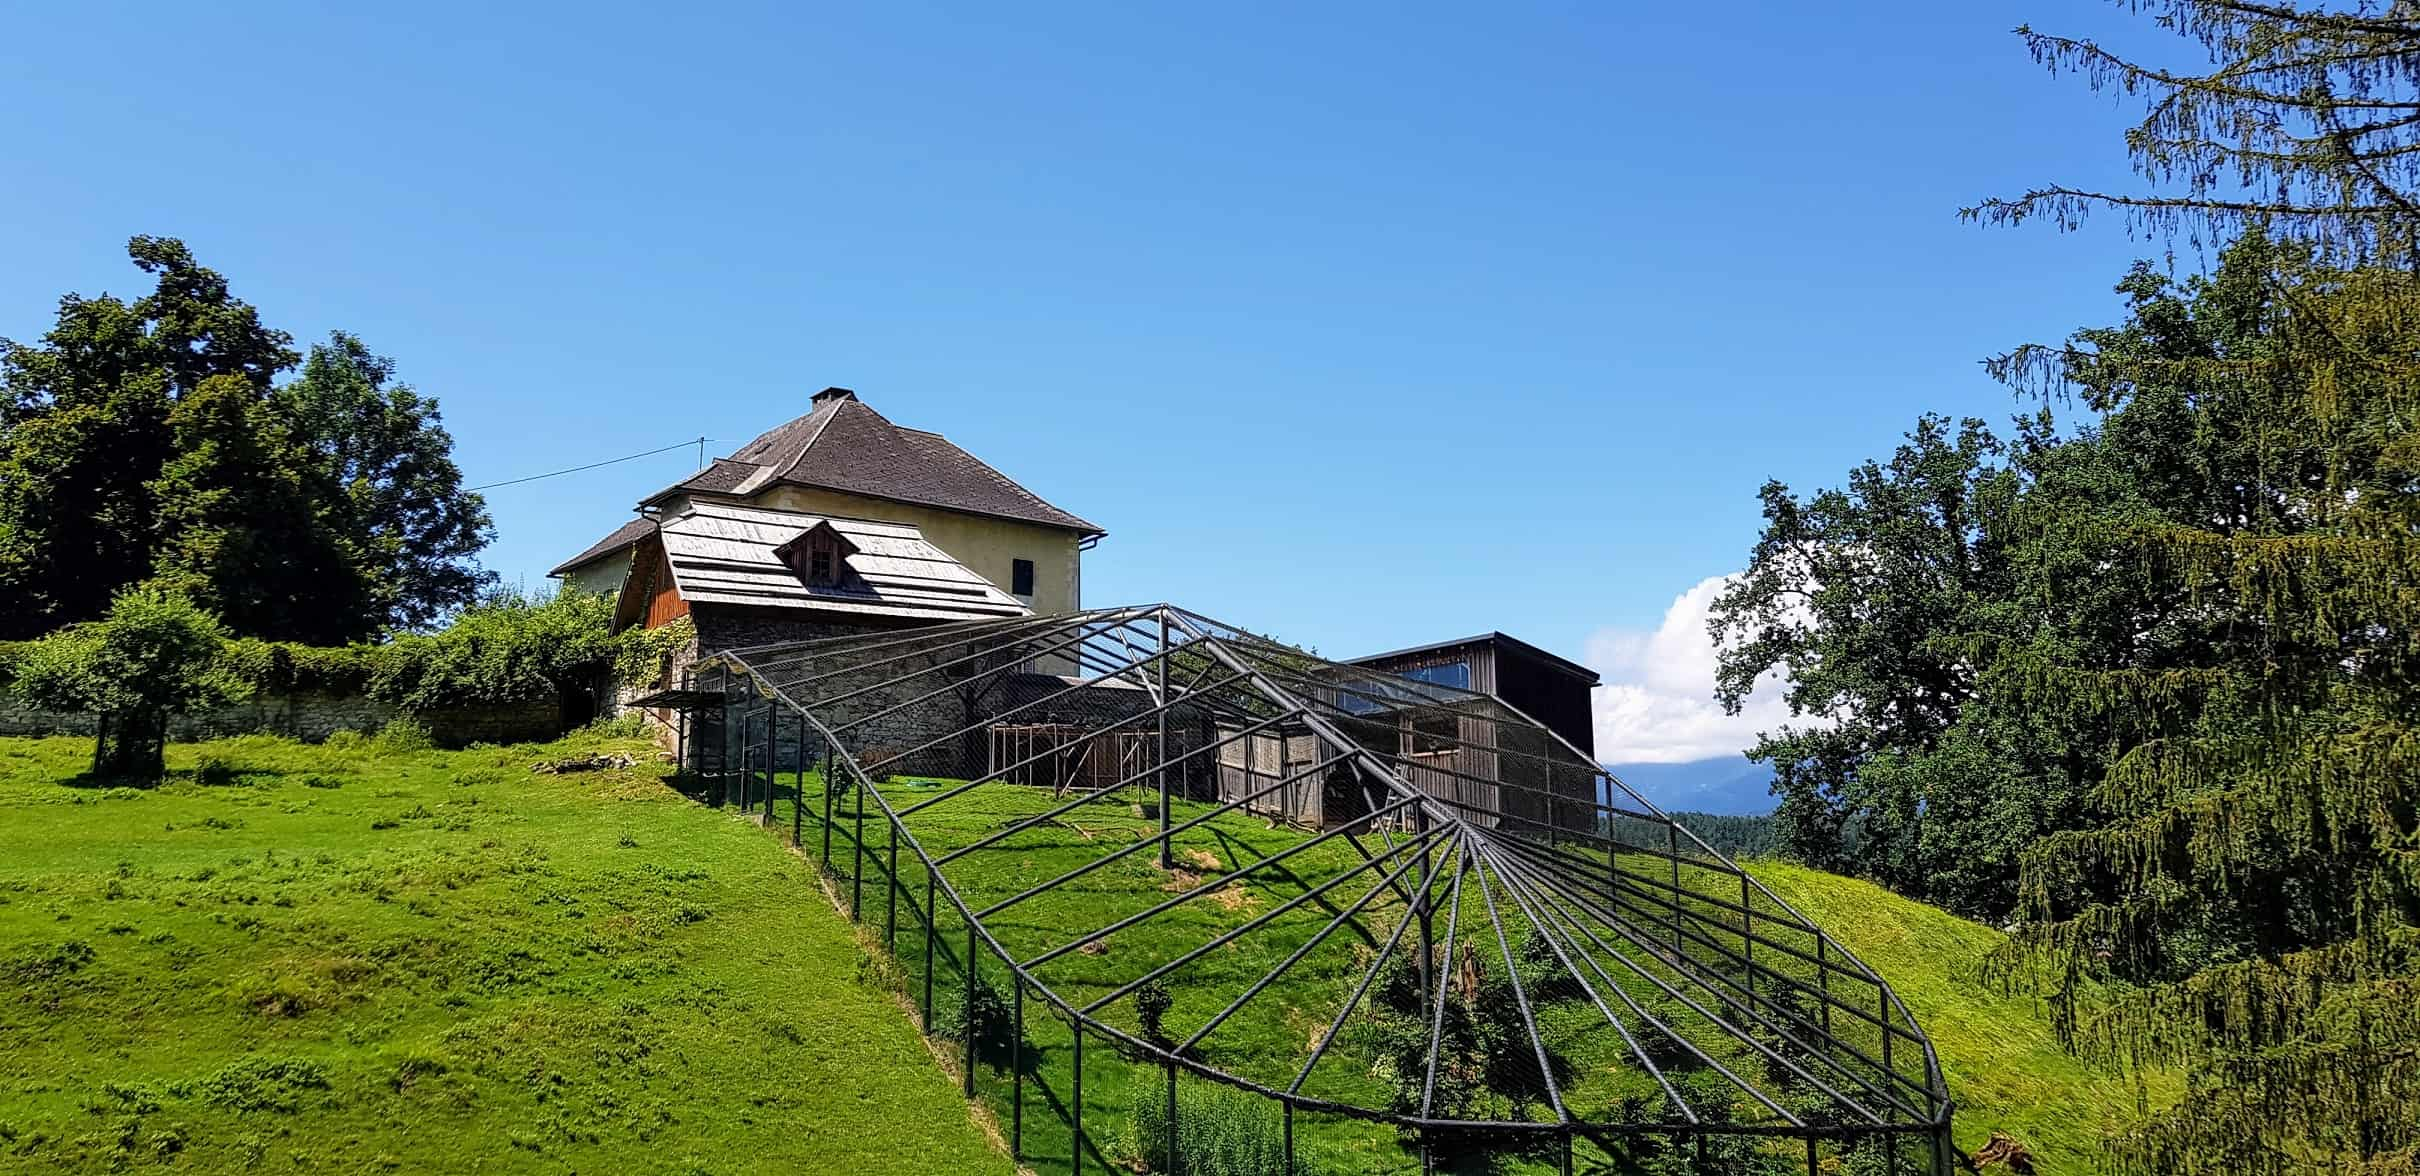 Waldrapp-Gehege Tierschutz Projekt Tierpark Rosegg